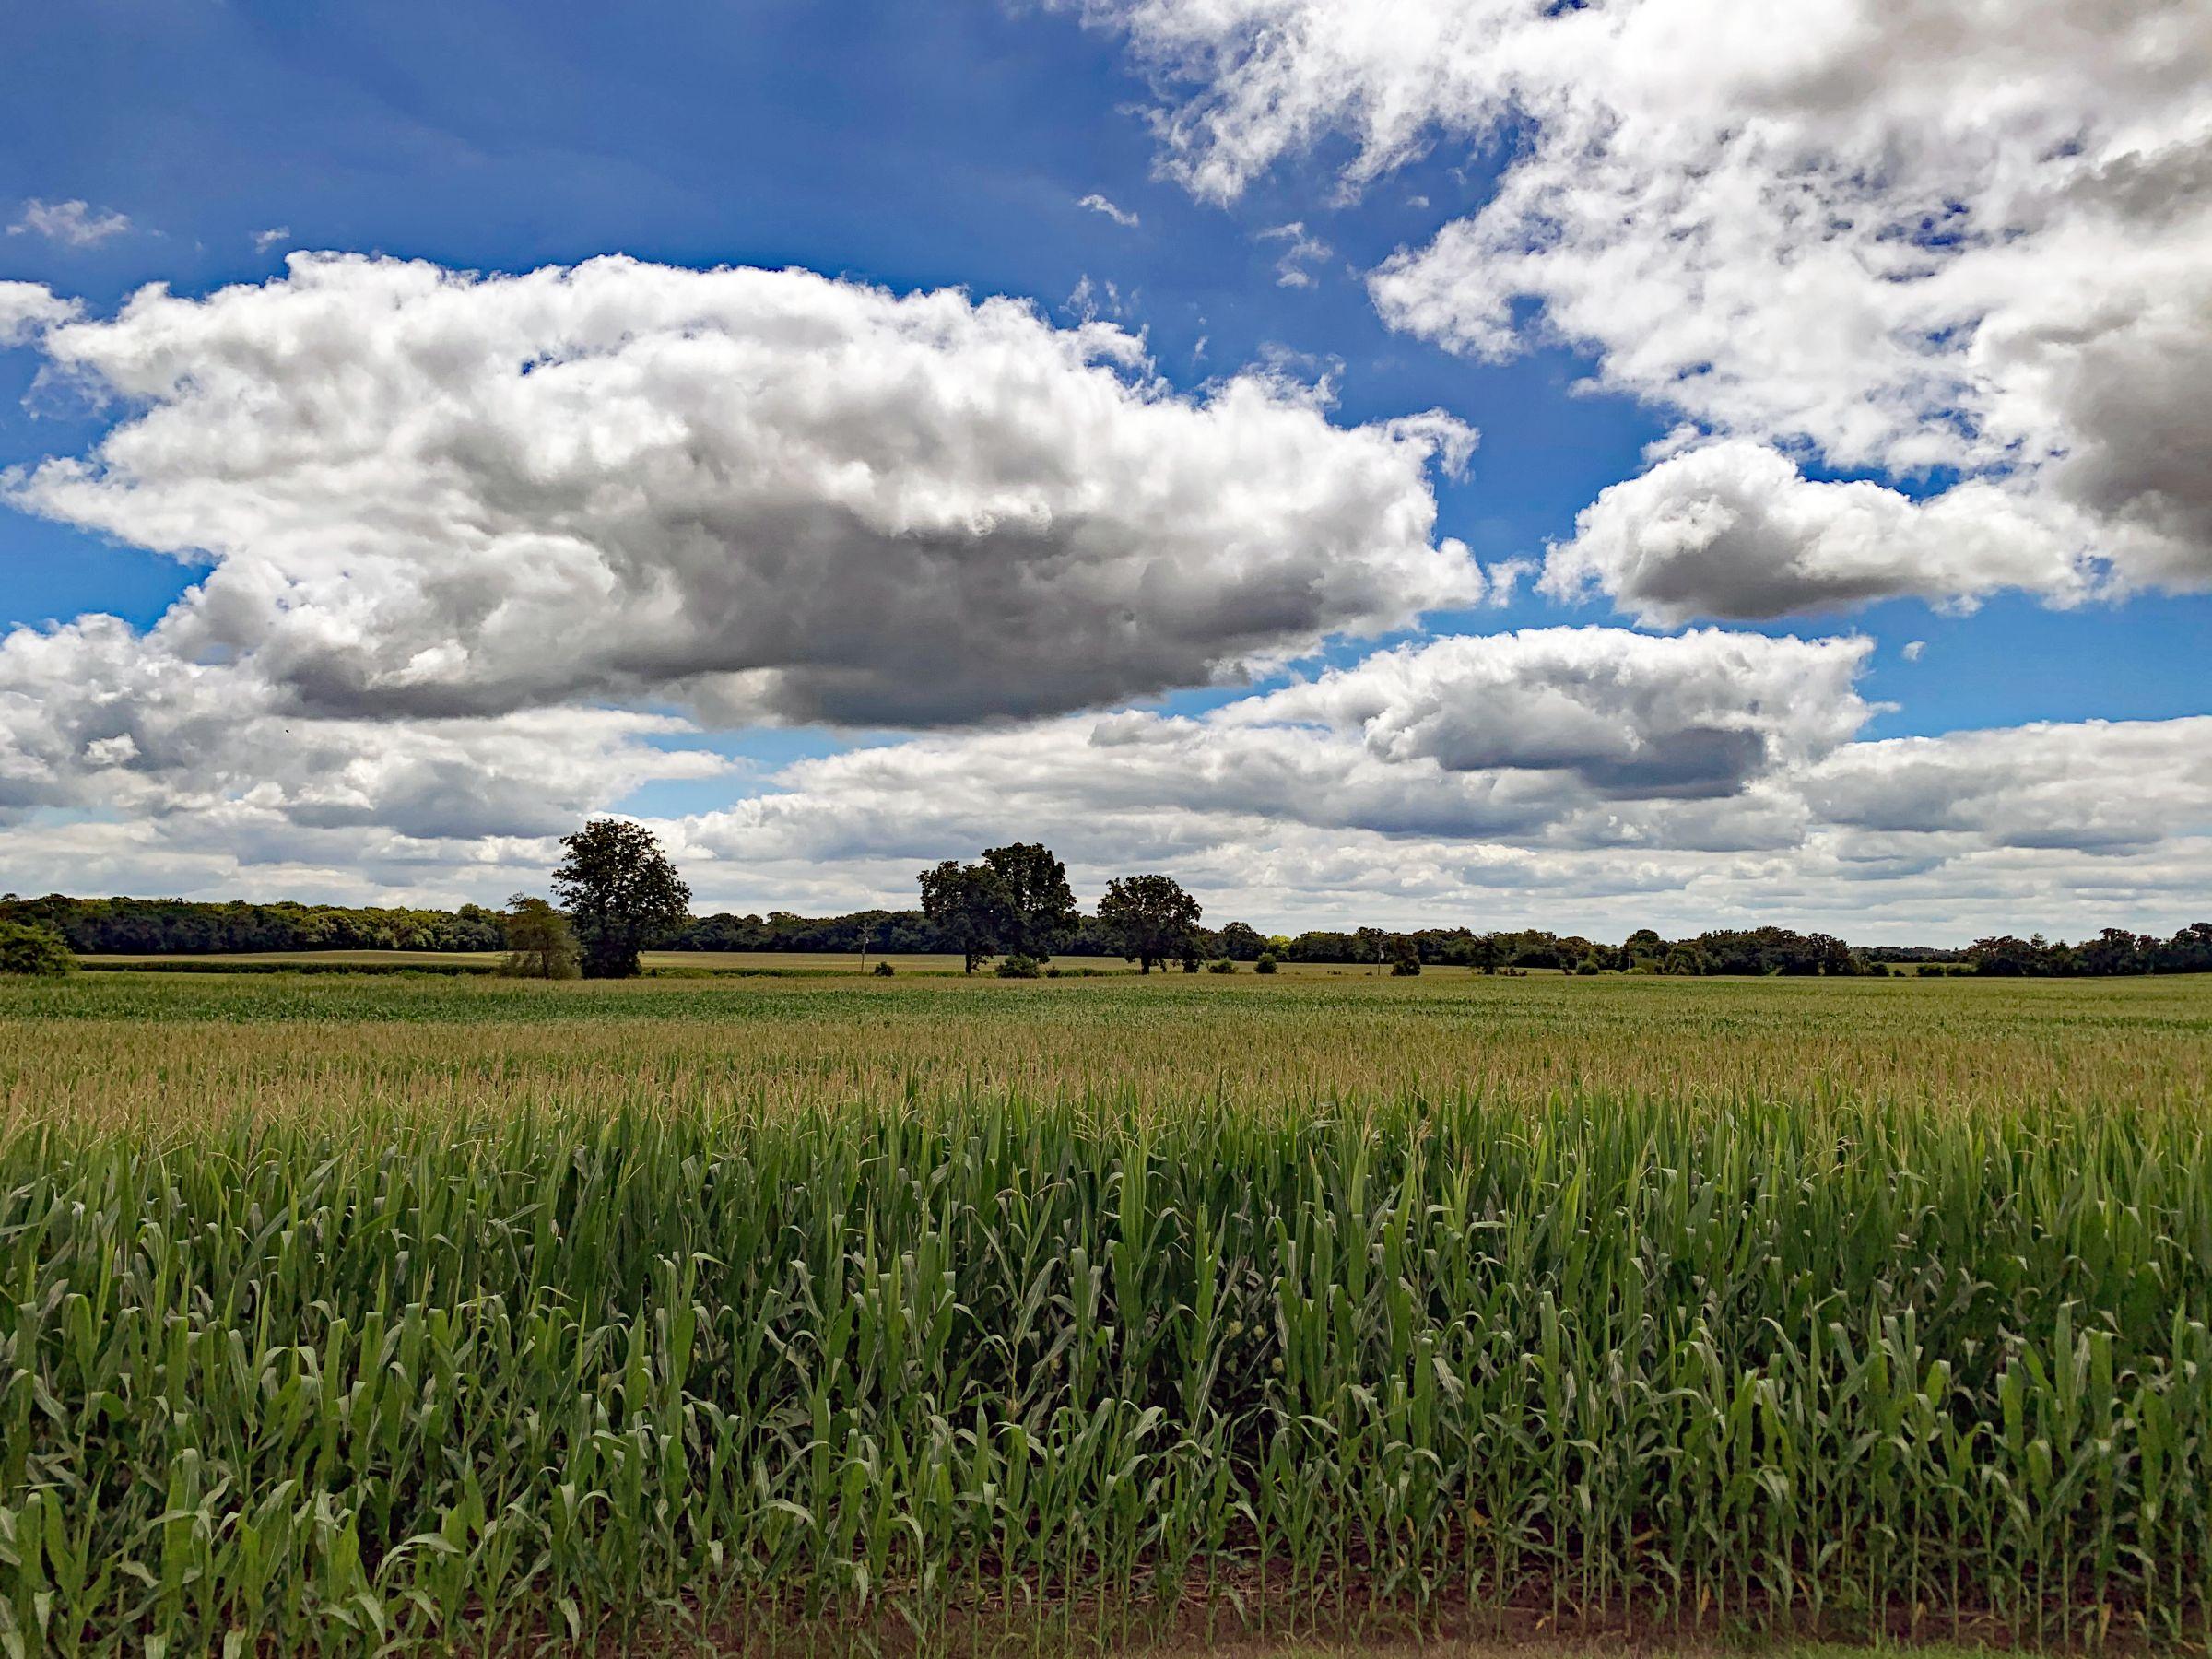 land-winnebago-county-illinois-127-acres-listing-number-15094-3-2020-08-03-160424.jpg